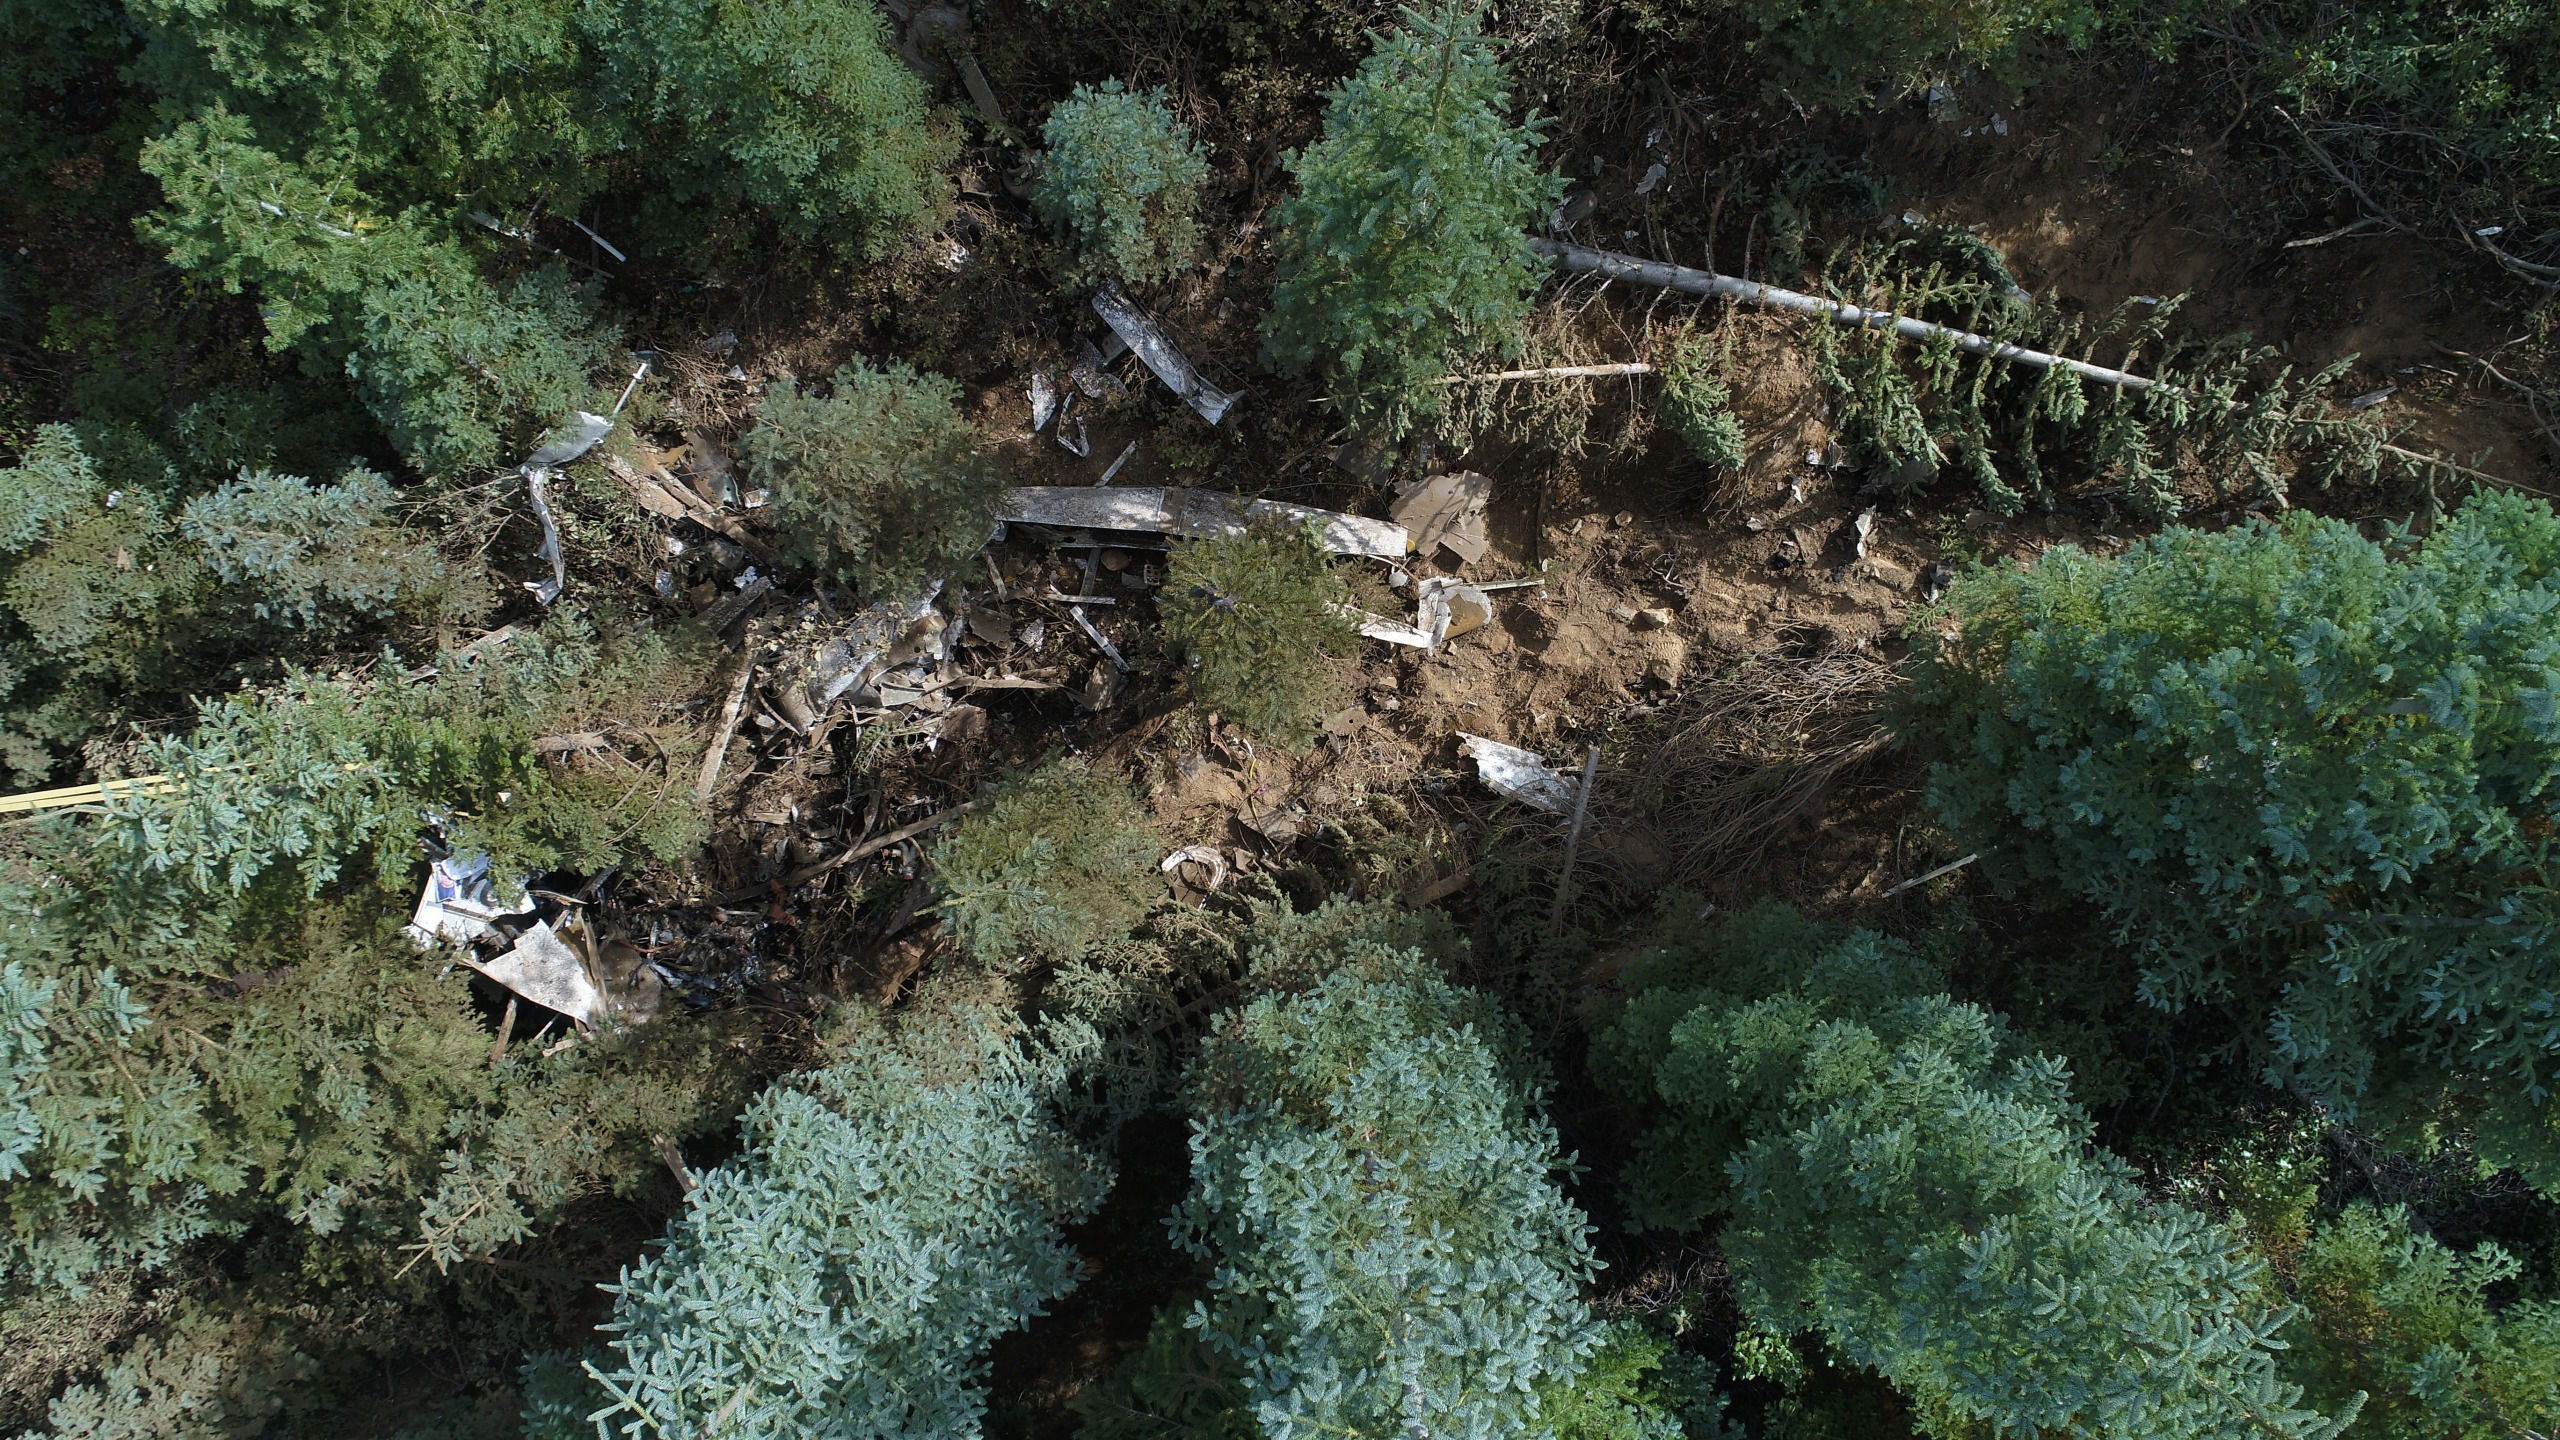 klamath falls plane crash osp 10022017_528317